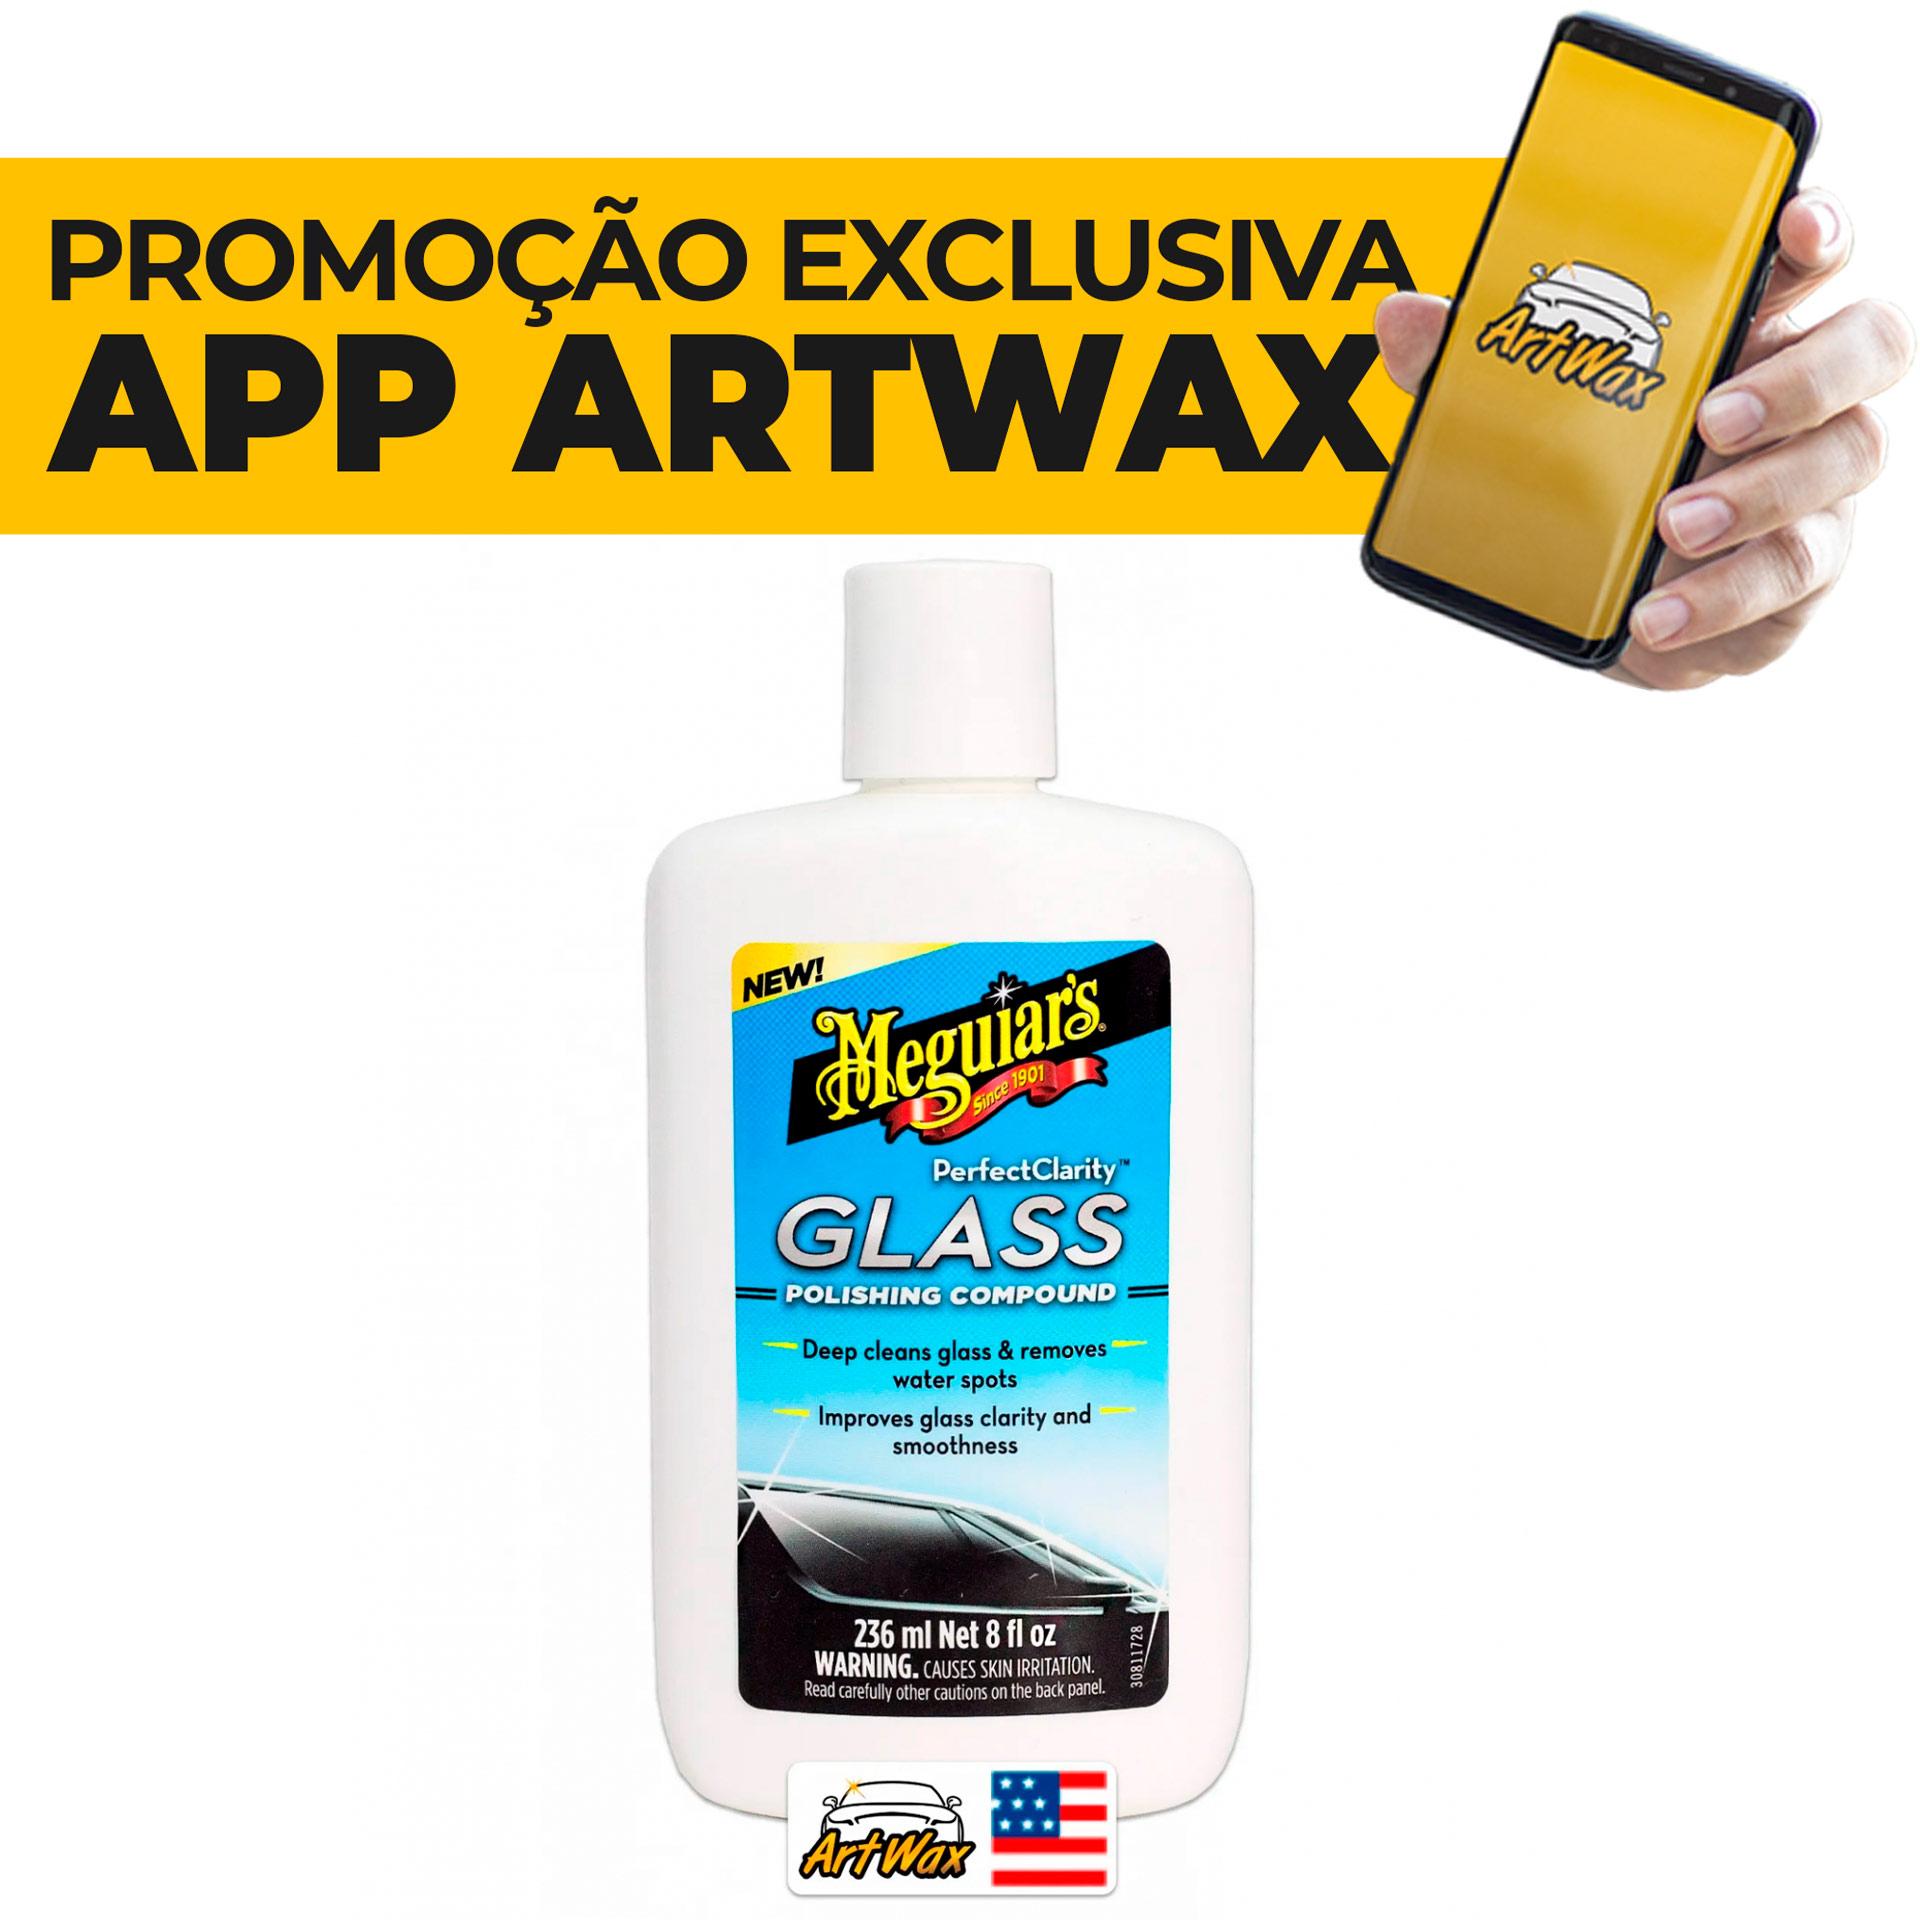 Meguiars Perfect Clarity Glass G8408 - Descontaminante Para Vidros 236ml